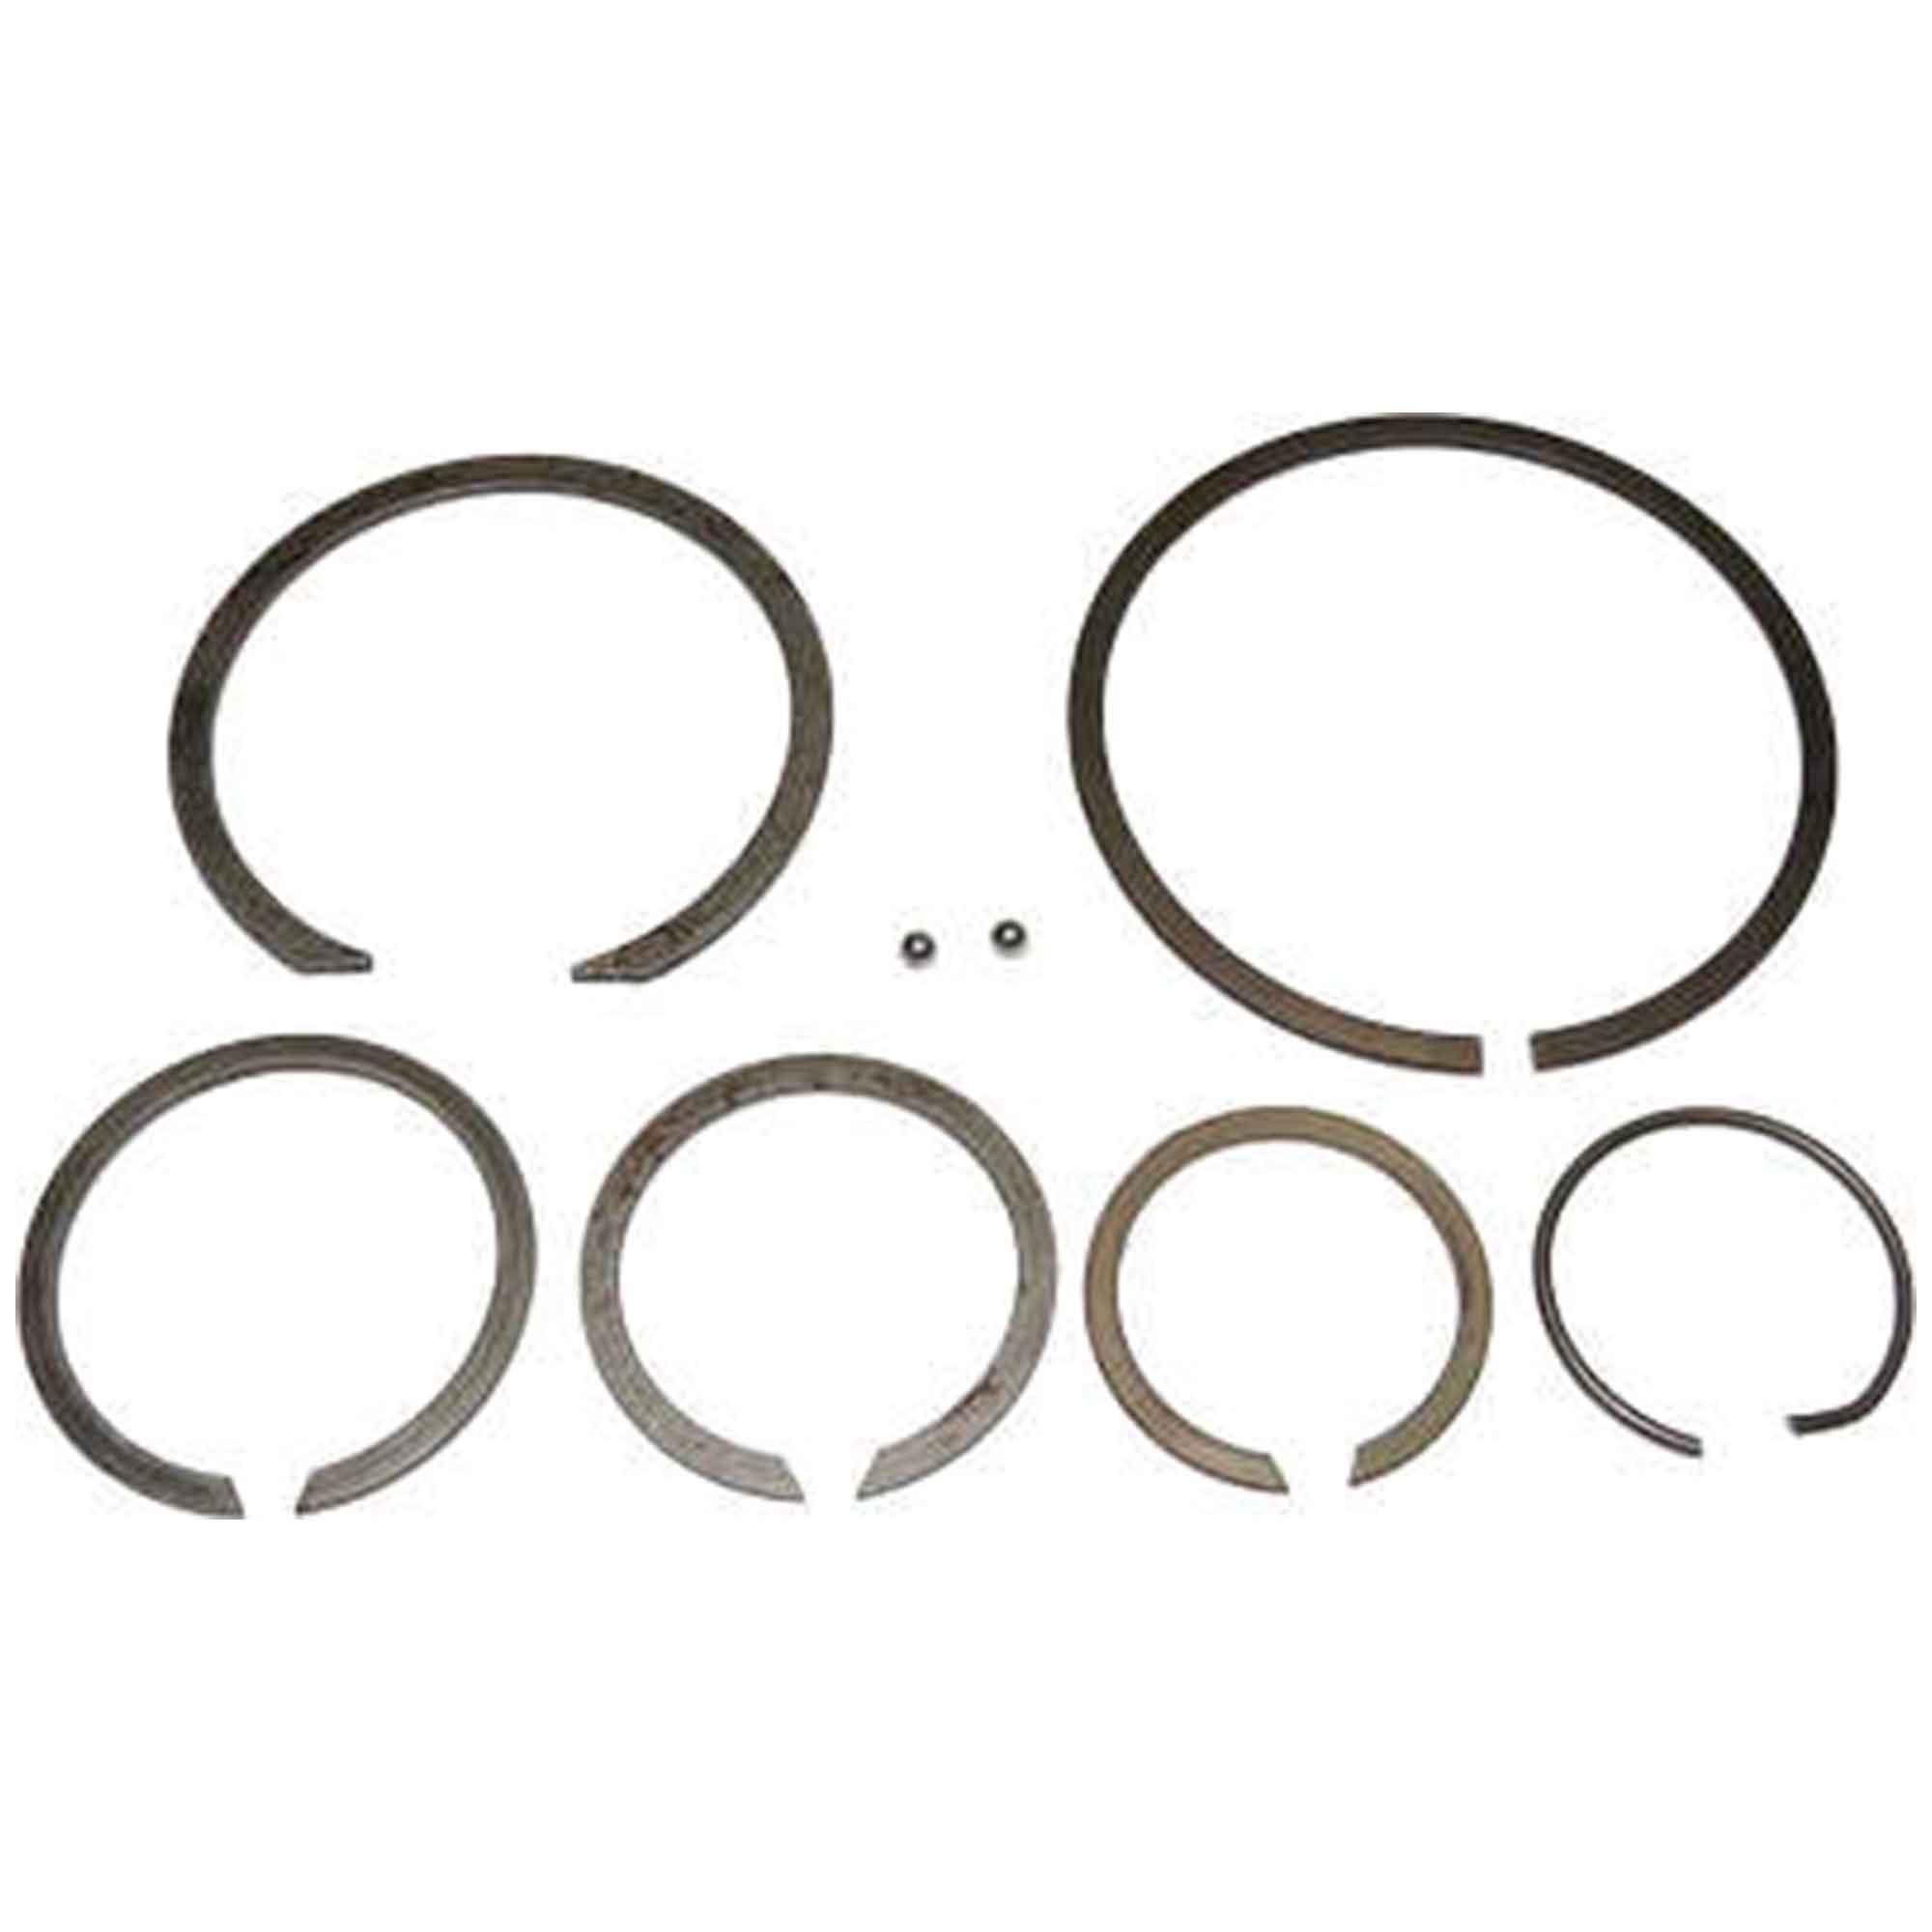 SUK513 - Kit de anéis travas cambio EATON FS5005 / FS5205